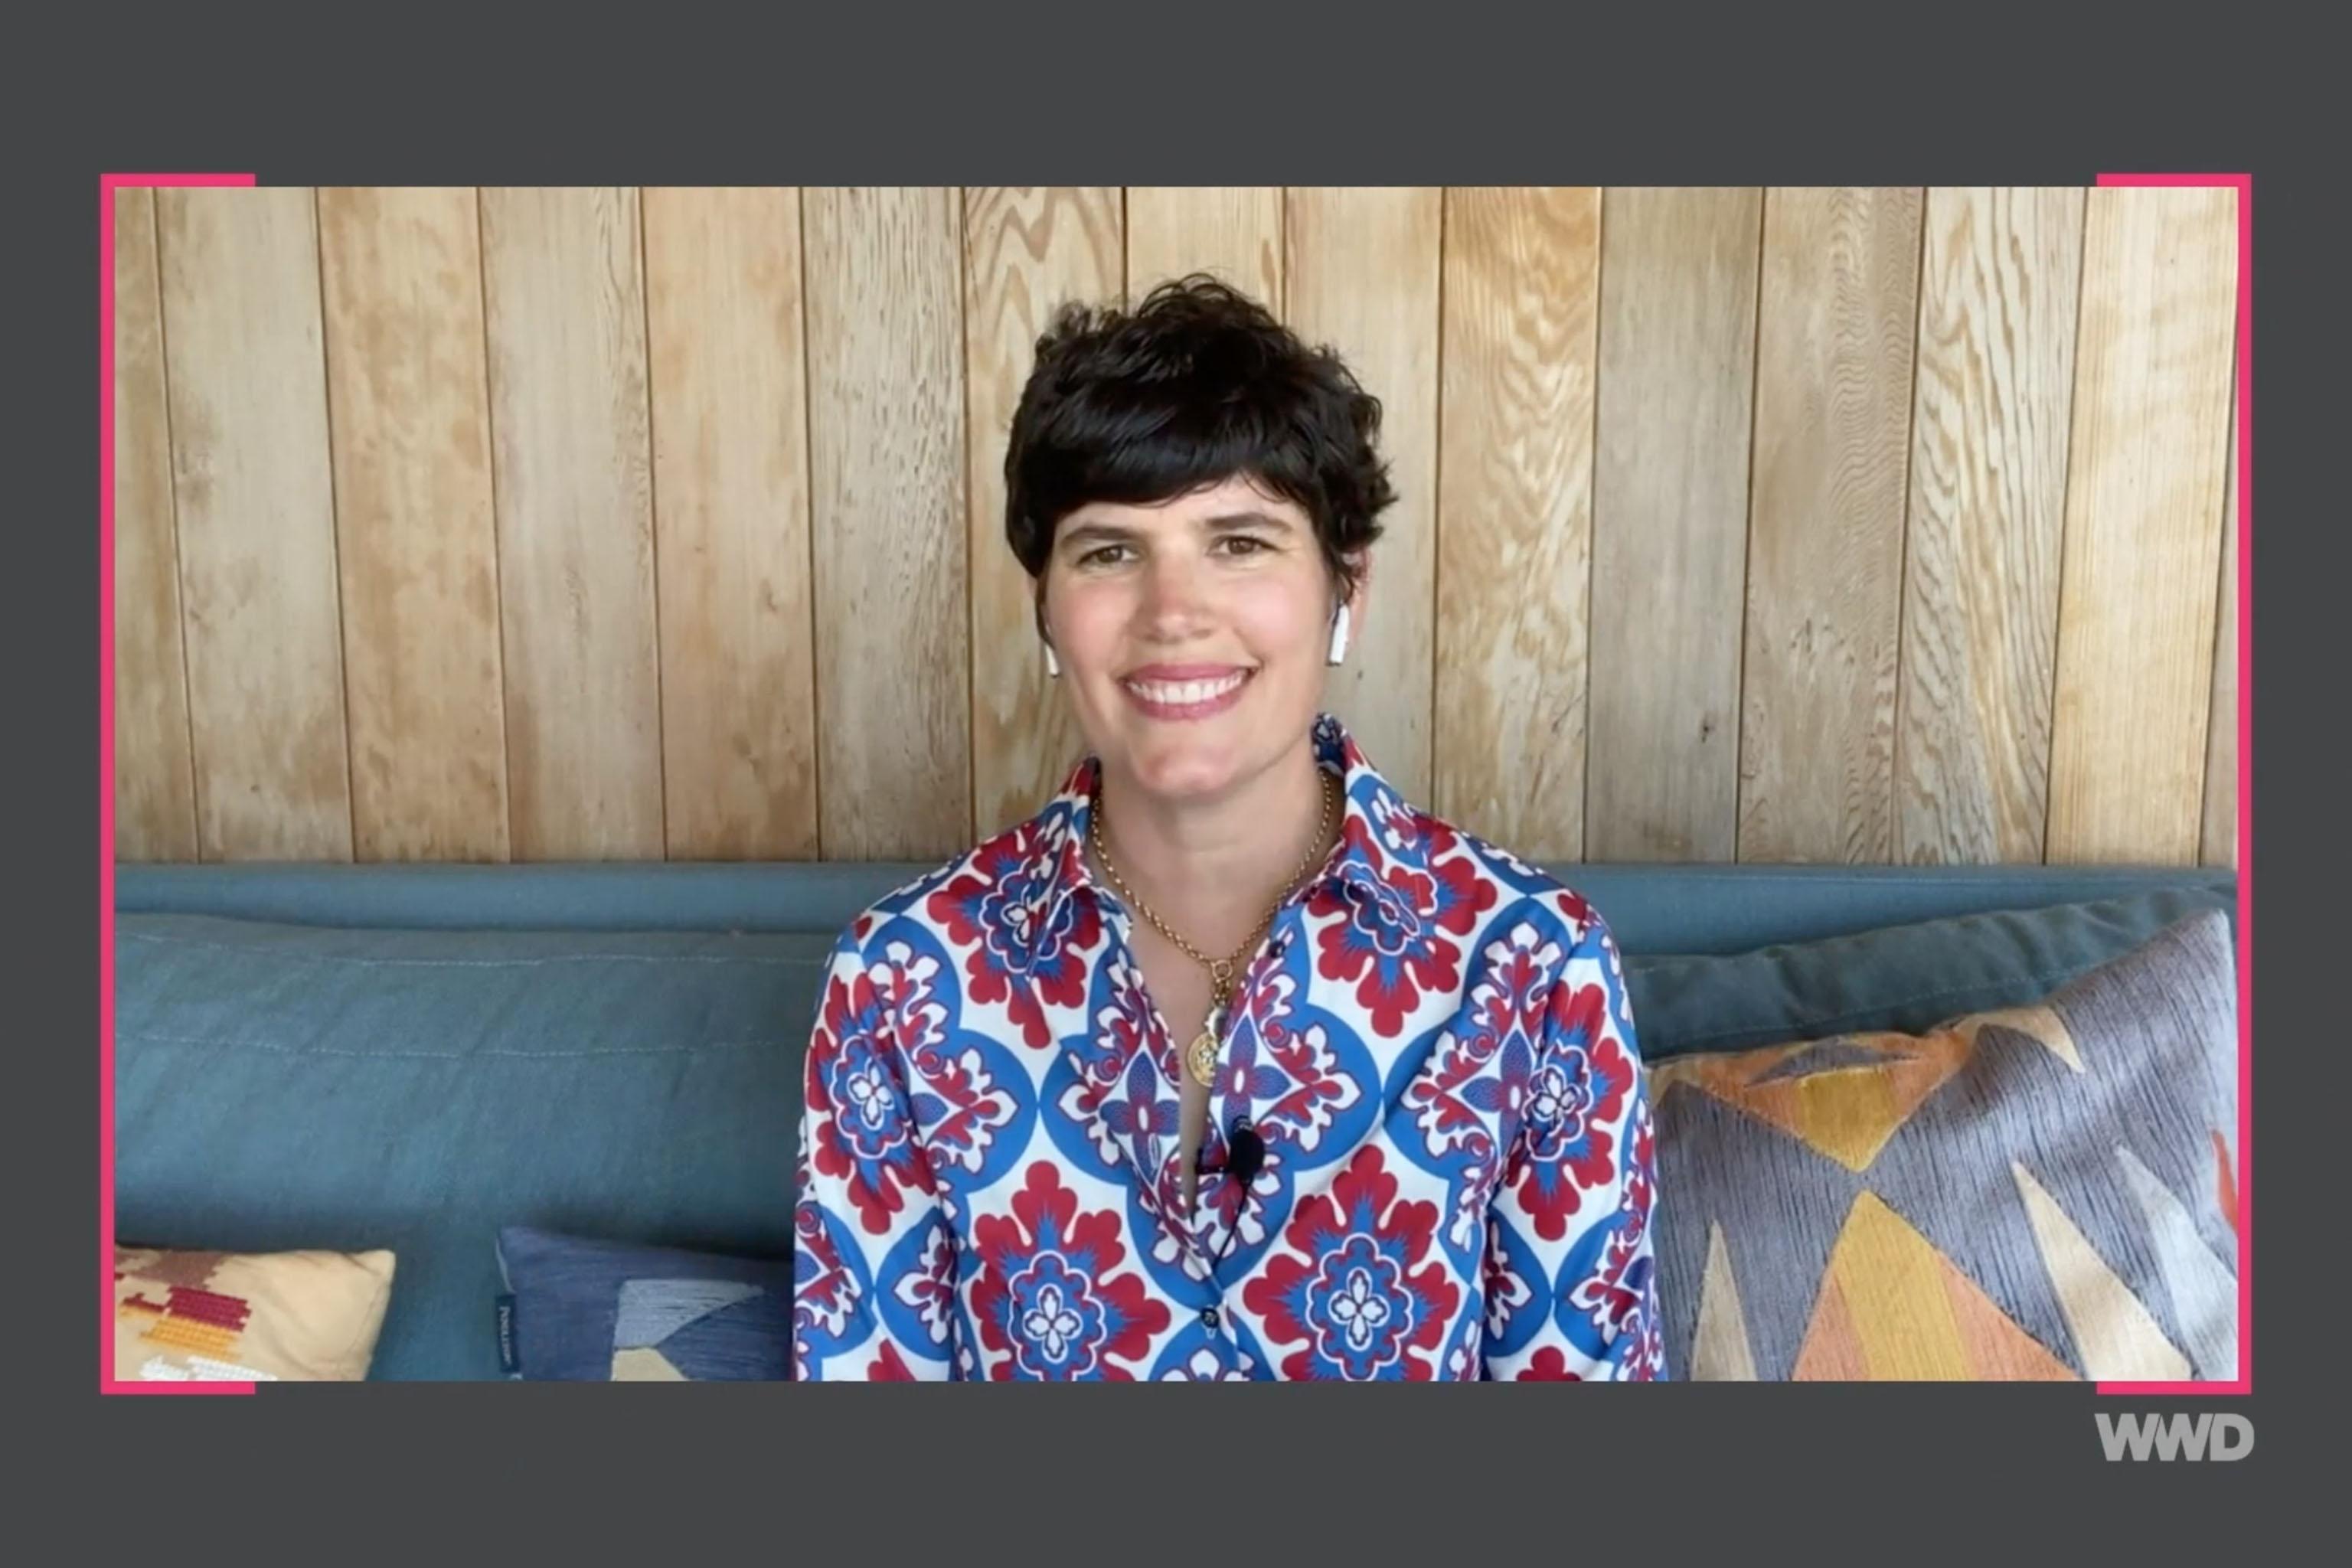 Elise Loehnen speaking at the WWD Wellness Summit.